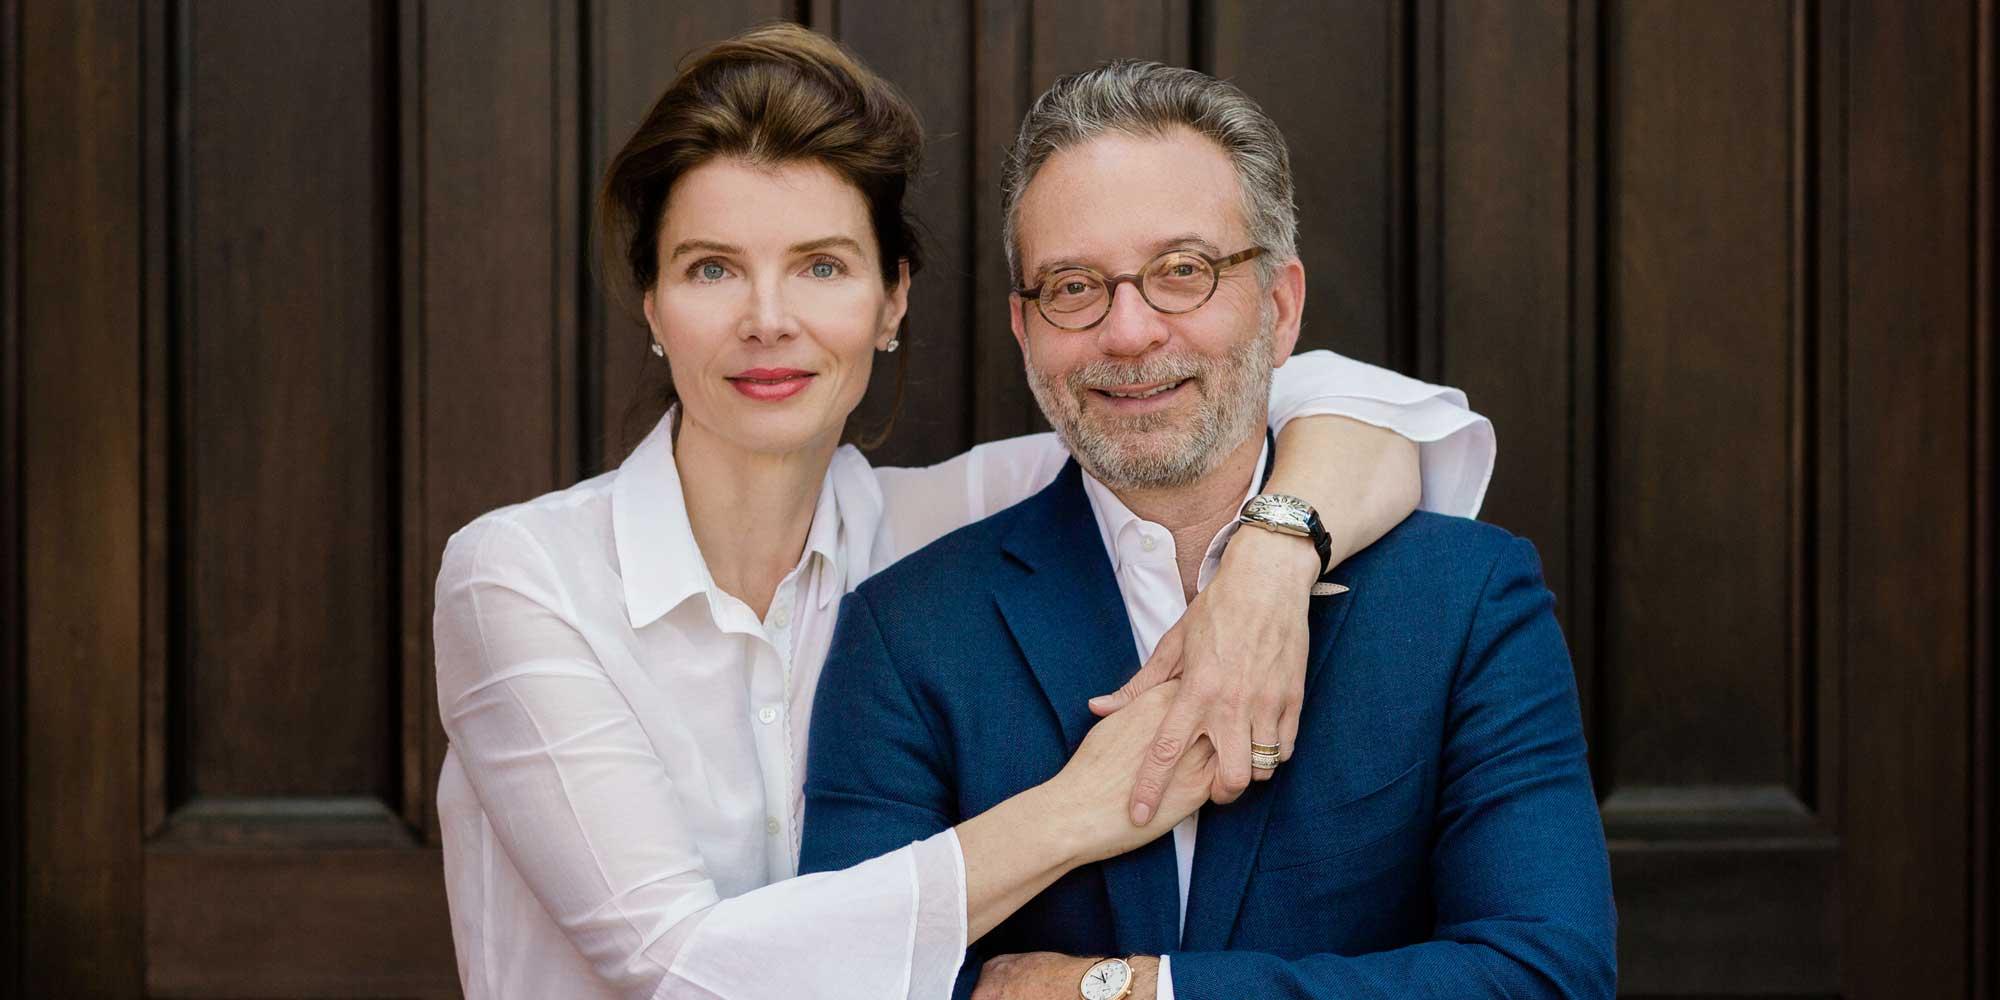 Melanie and Pascal Levensohn